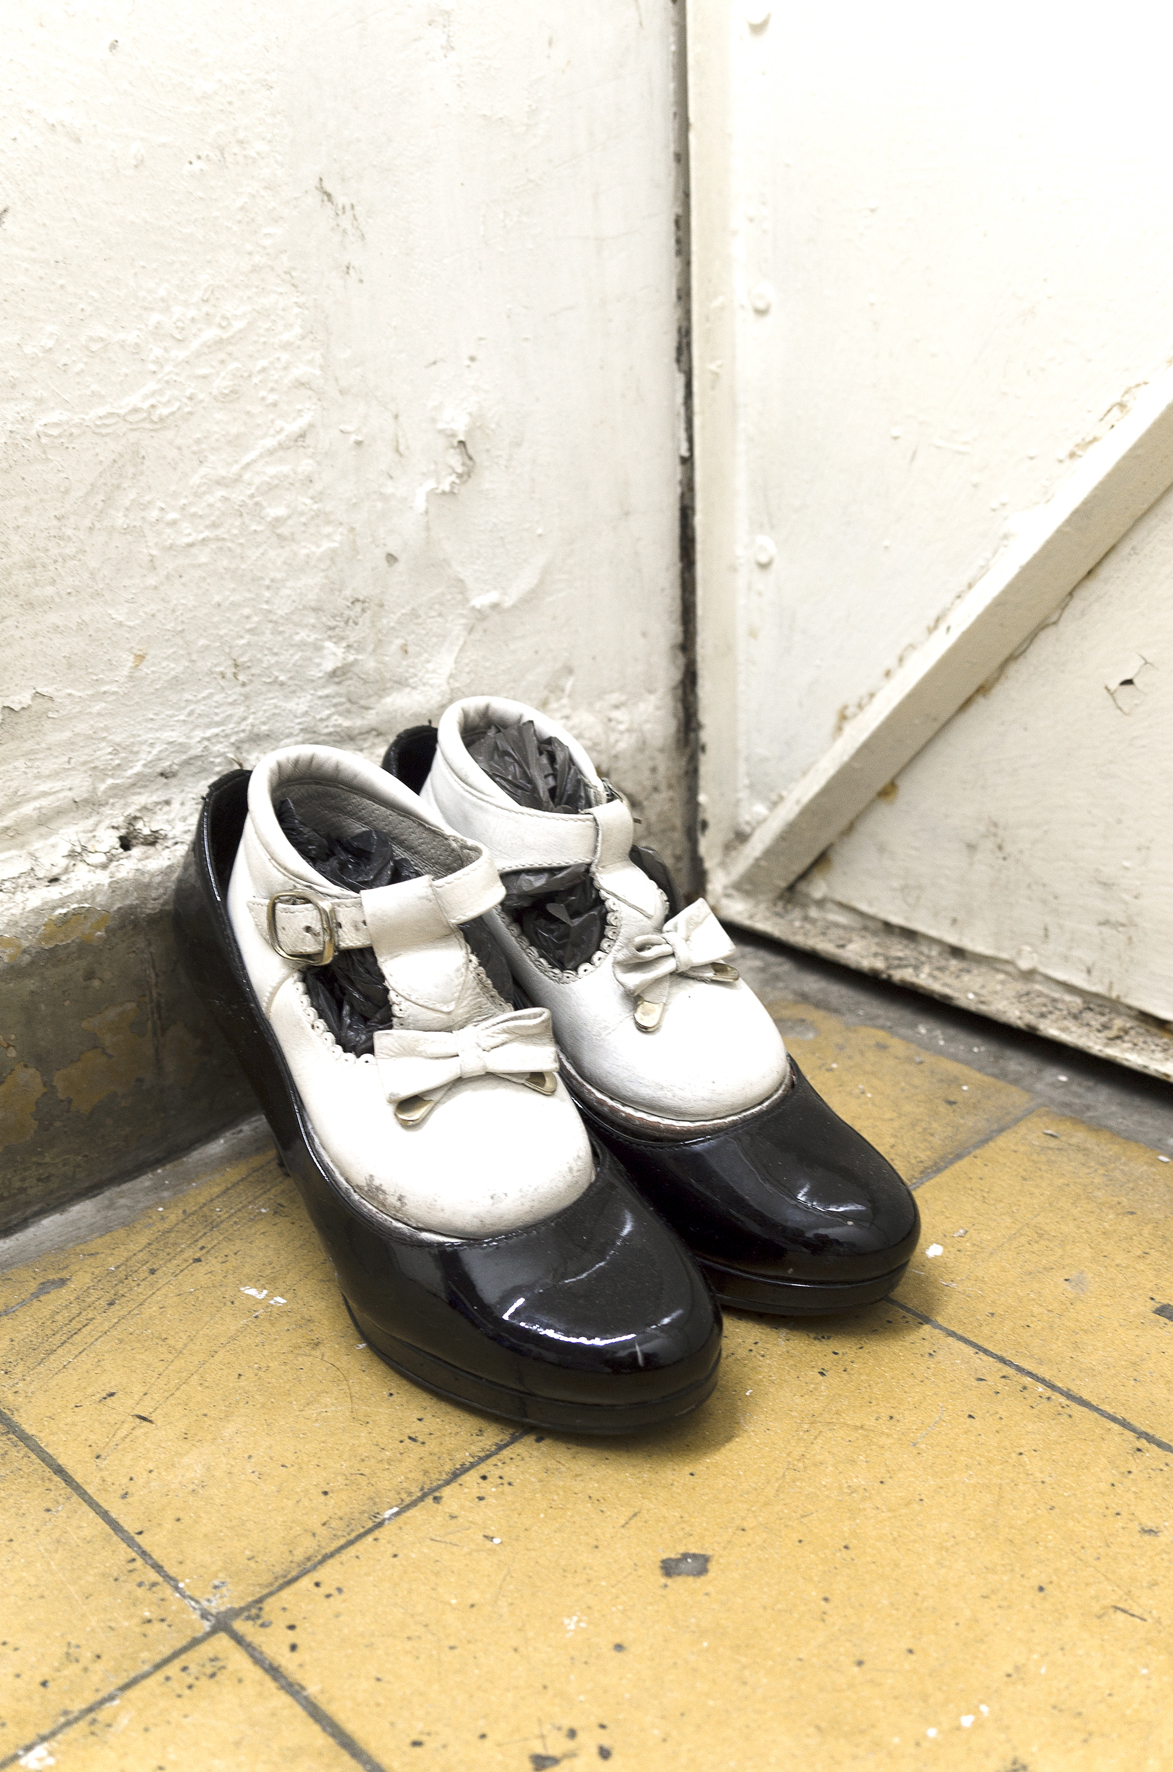 Valle Escondido, 2005, Shoes, 23 x 15 x 15cm